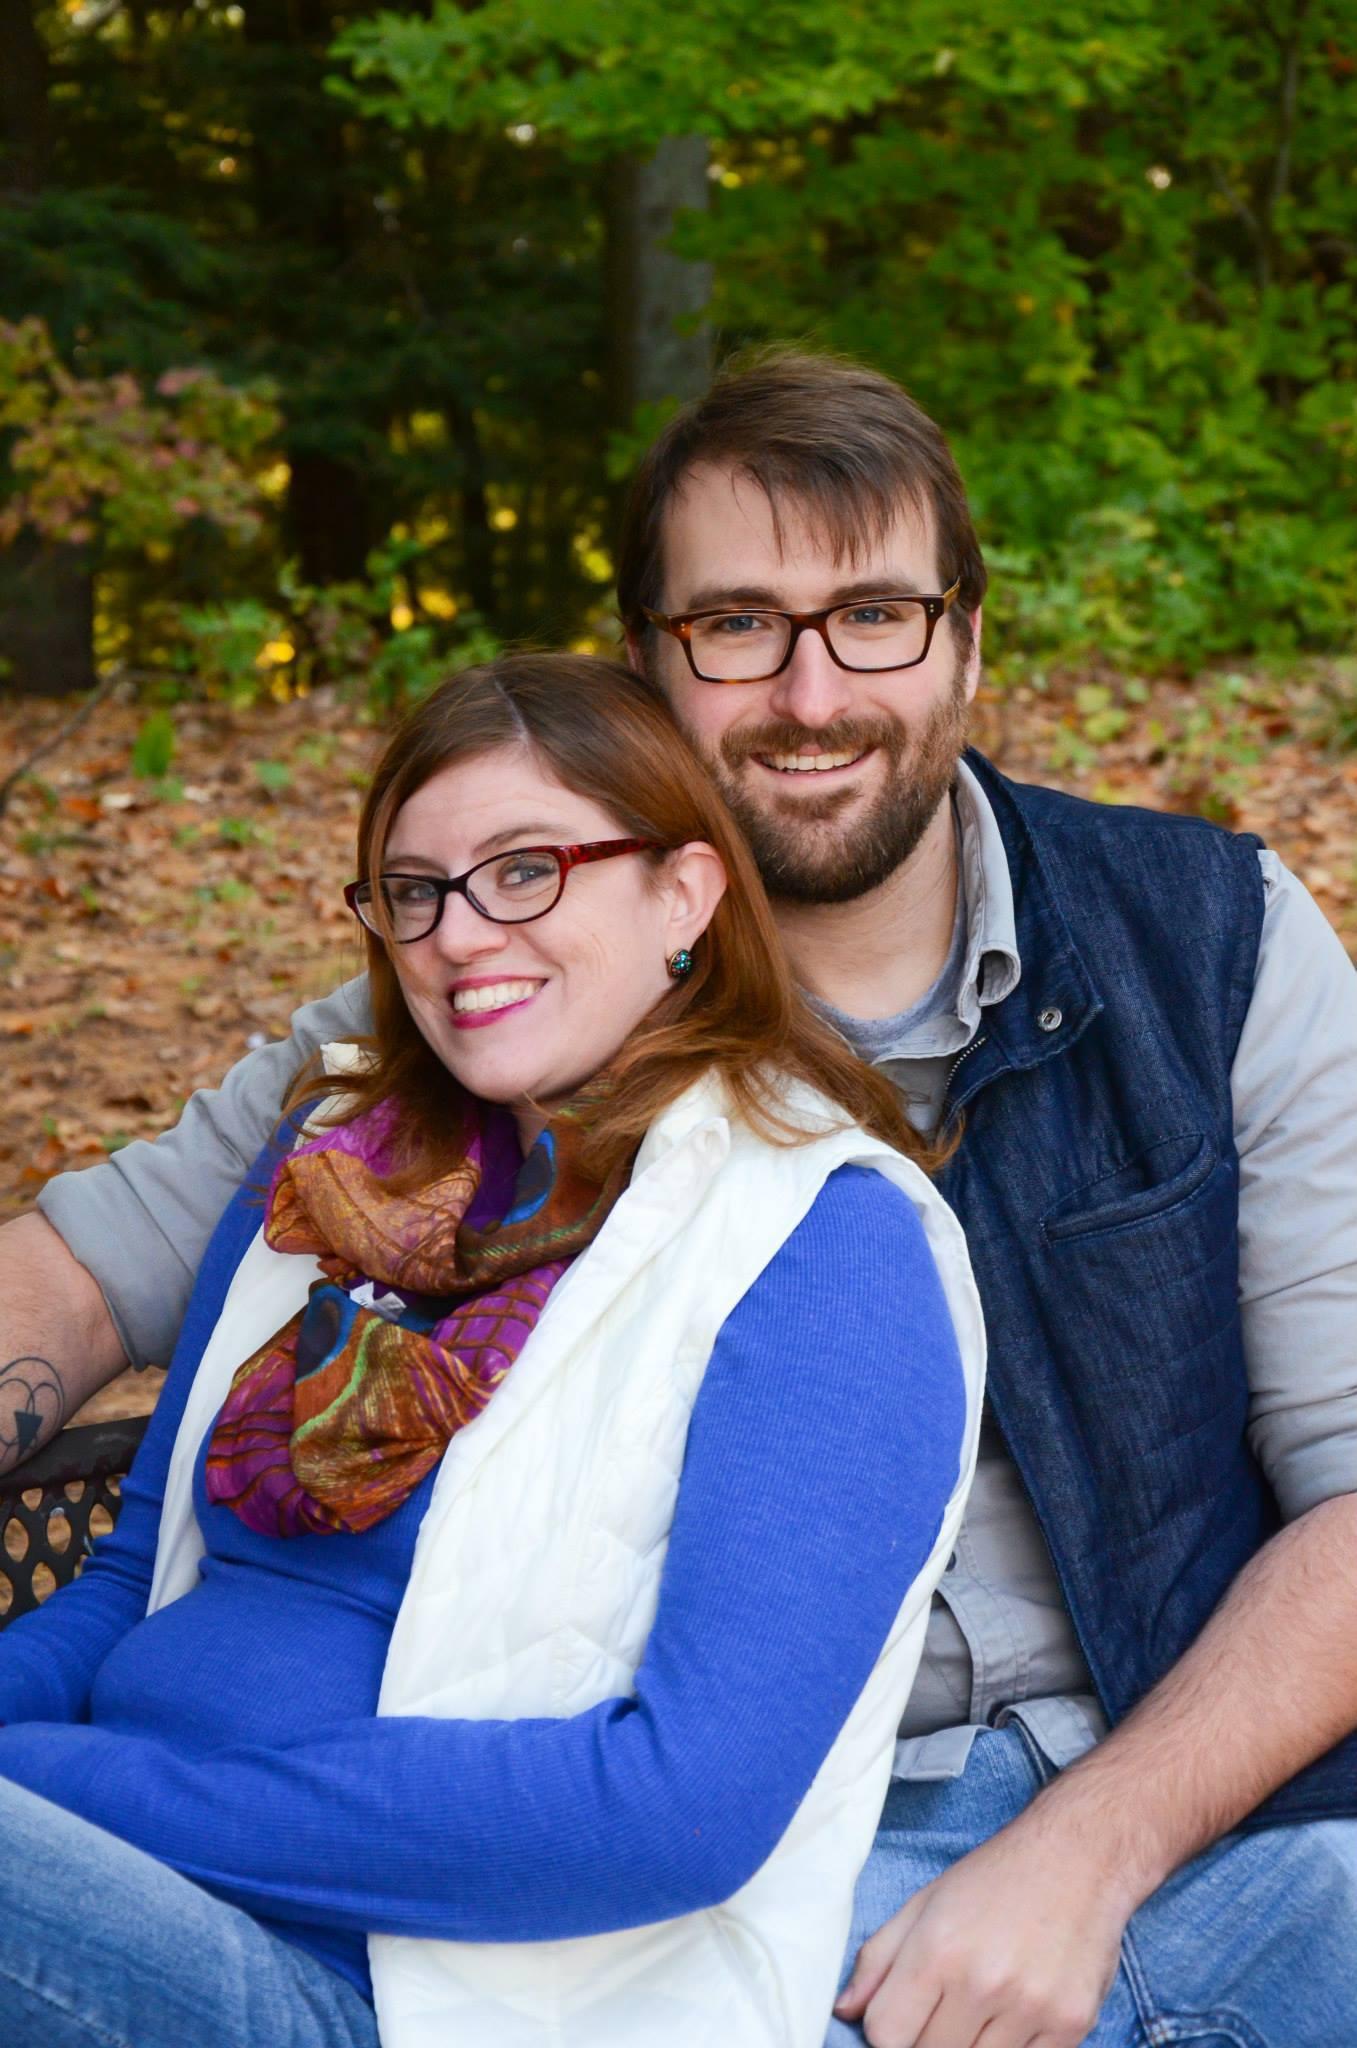 Guest Blogger Kyle Kiekintveld (with his fiancé Jessica Poel)